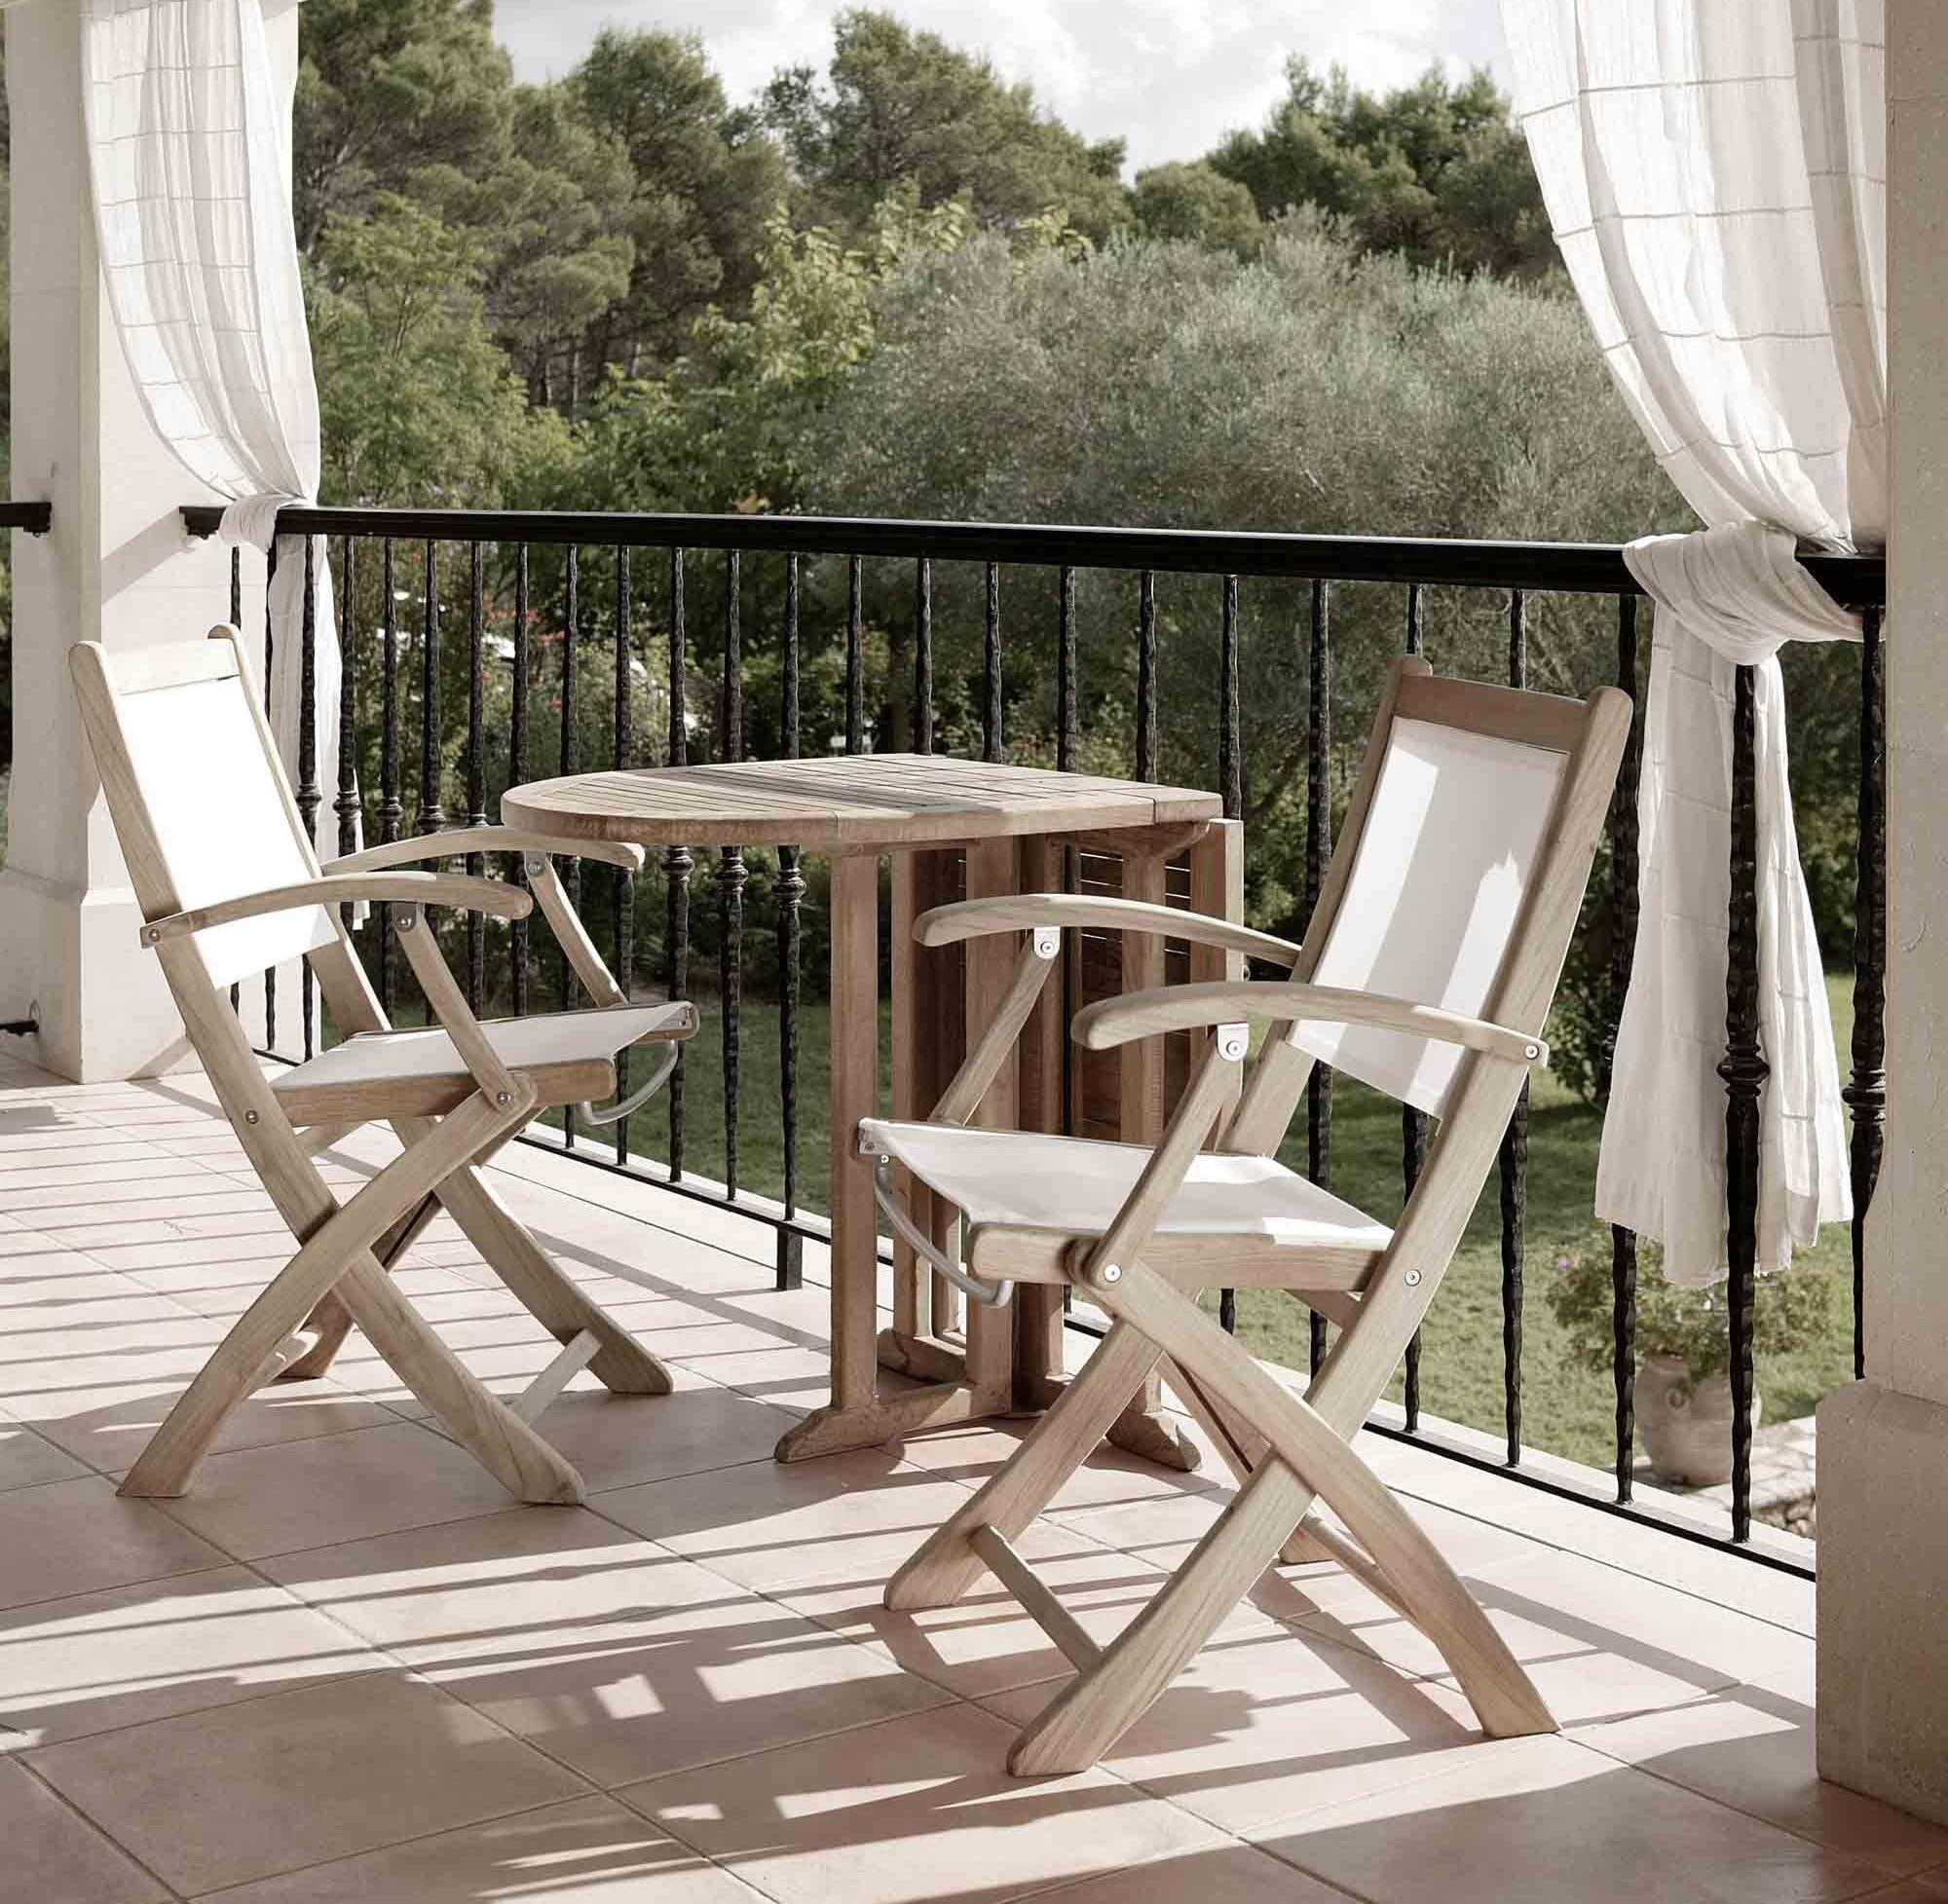 Gartenmöbel im Country Style (Landhausstil) – Holzland Verbeek